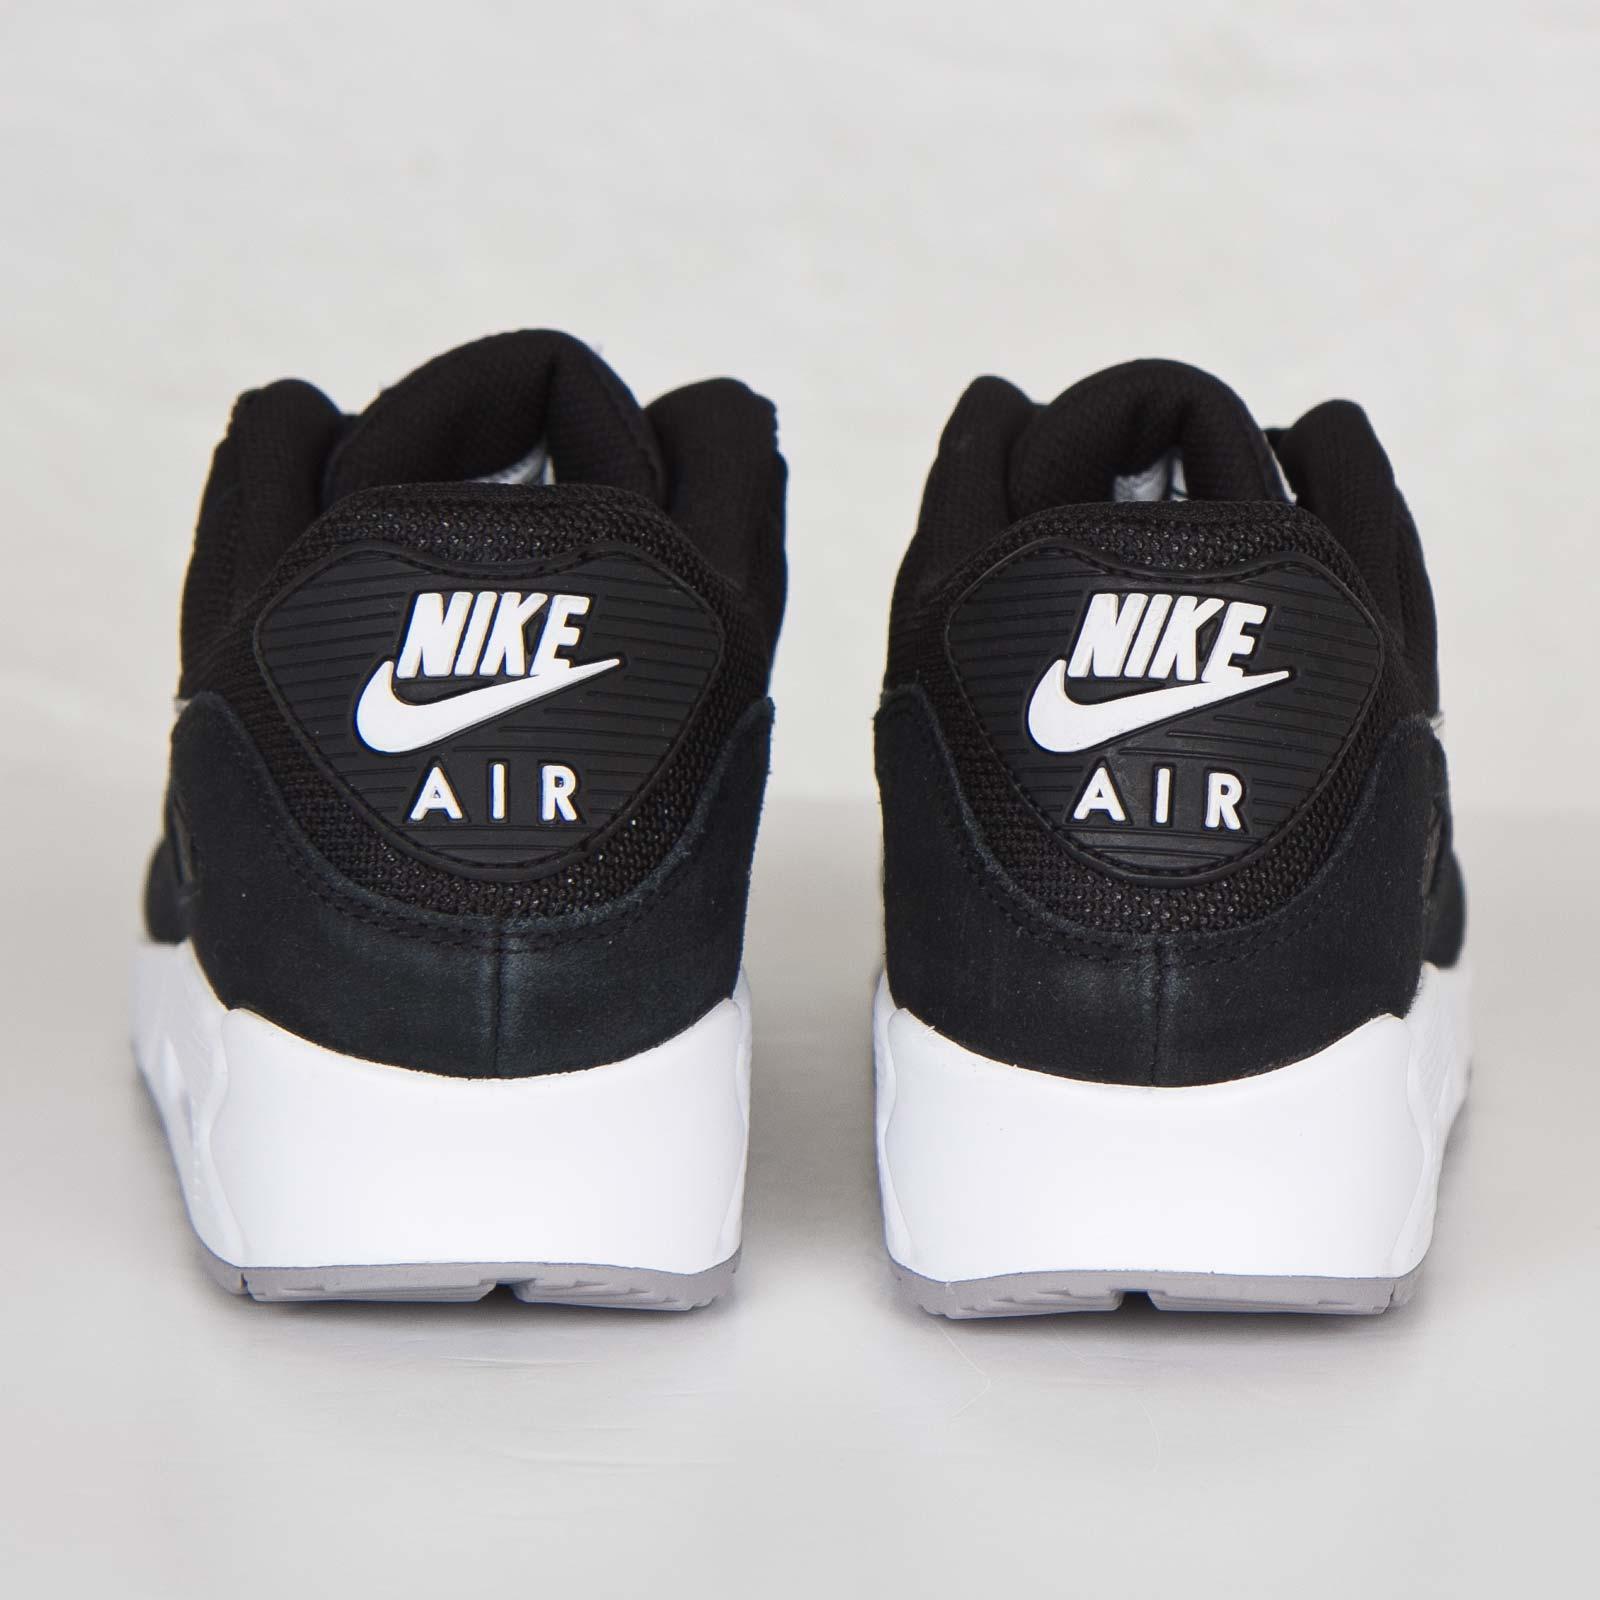 official photos 9fb63 43809 Nike Air Max 90 Essential - 537384-047 - Sneakersnstuff   sneakers    streetwear online since 1999